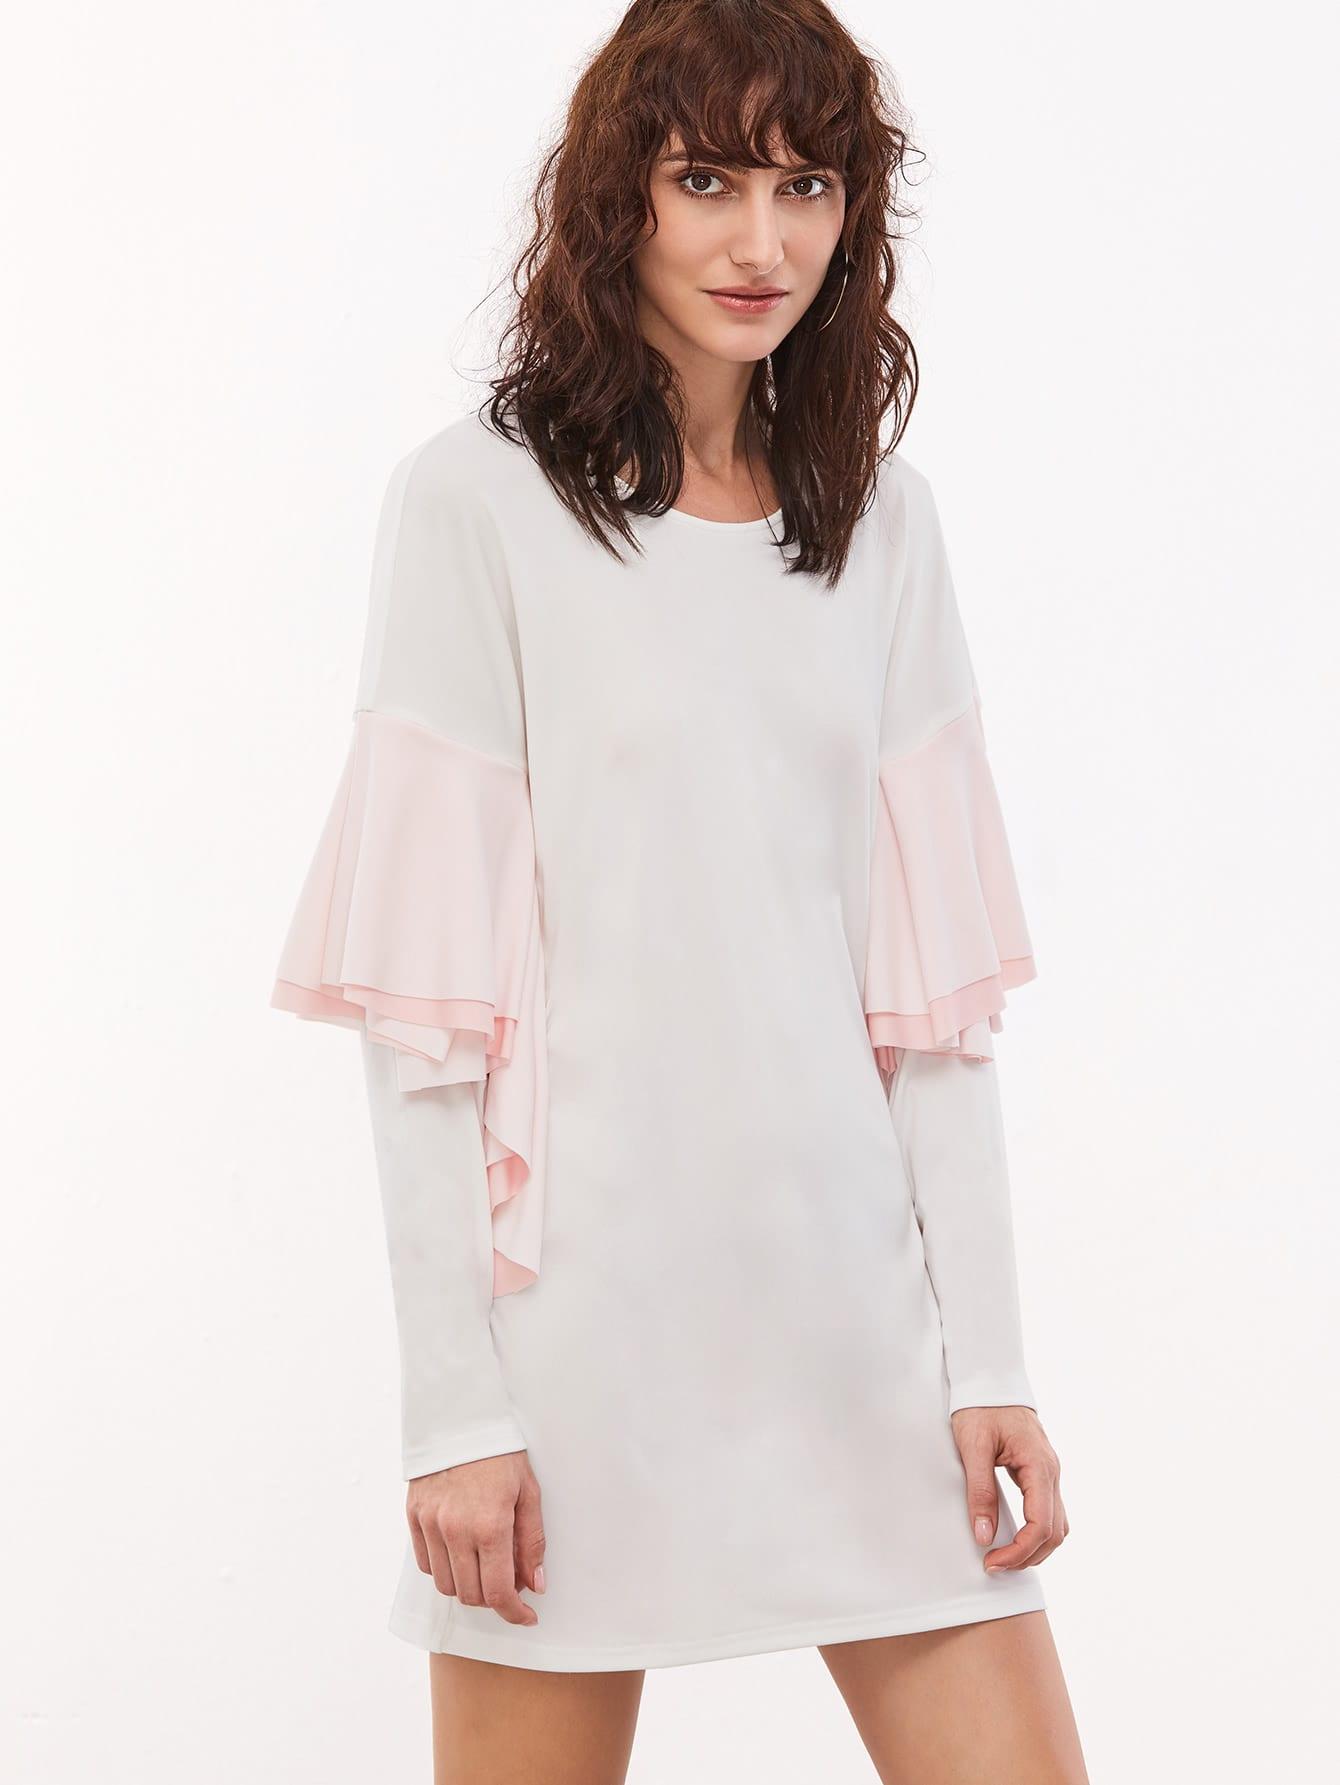 White Drop Shoulder Contrast Ruffle Trim Shift Dress dress161130717